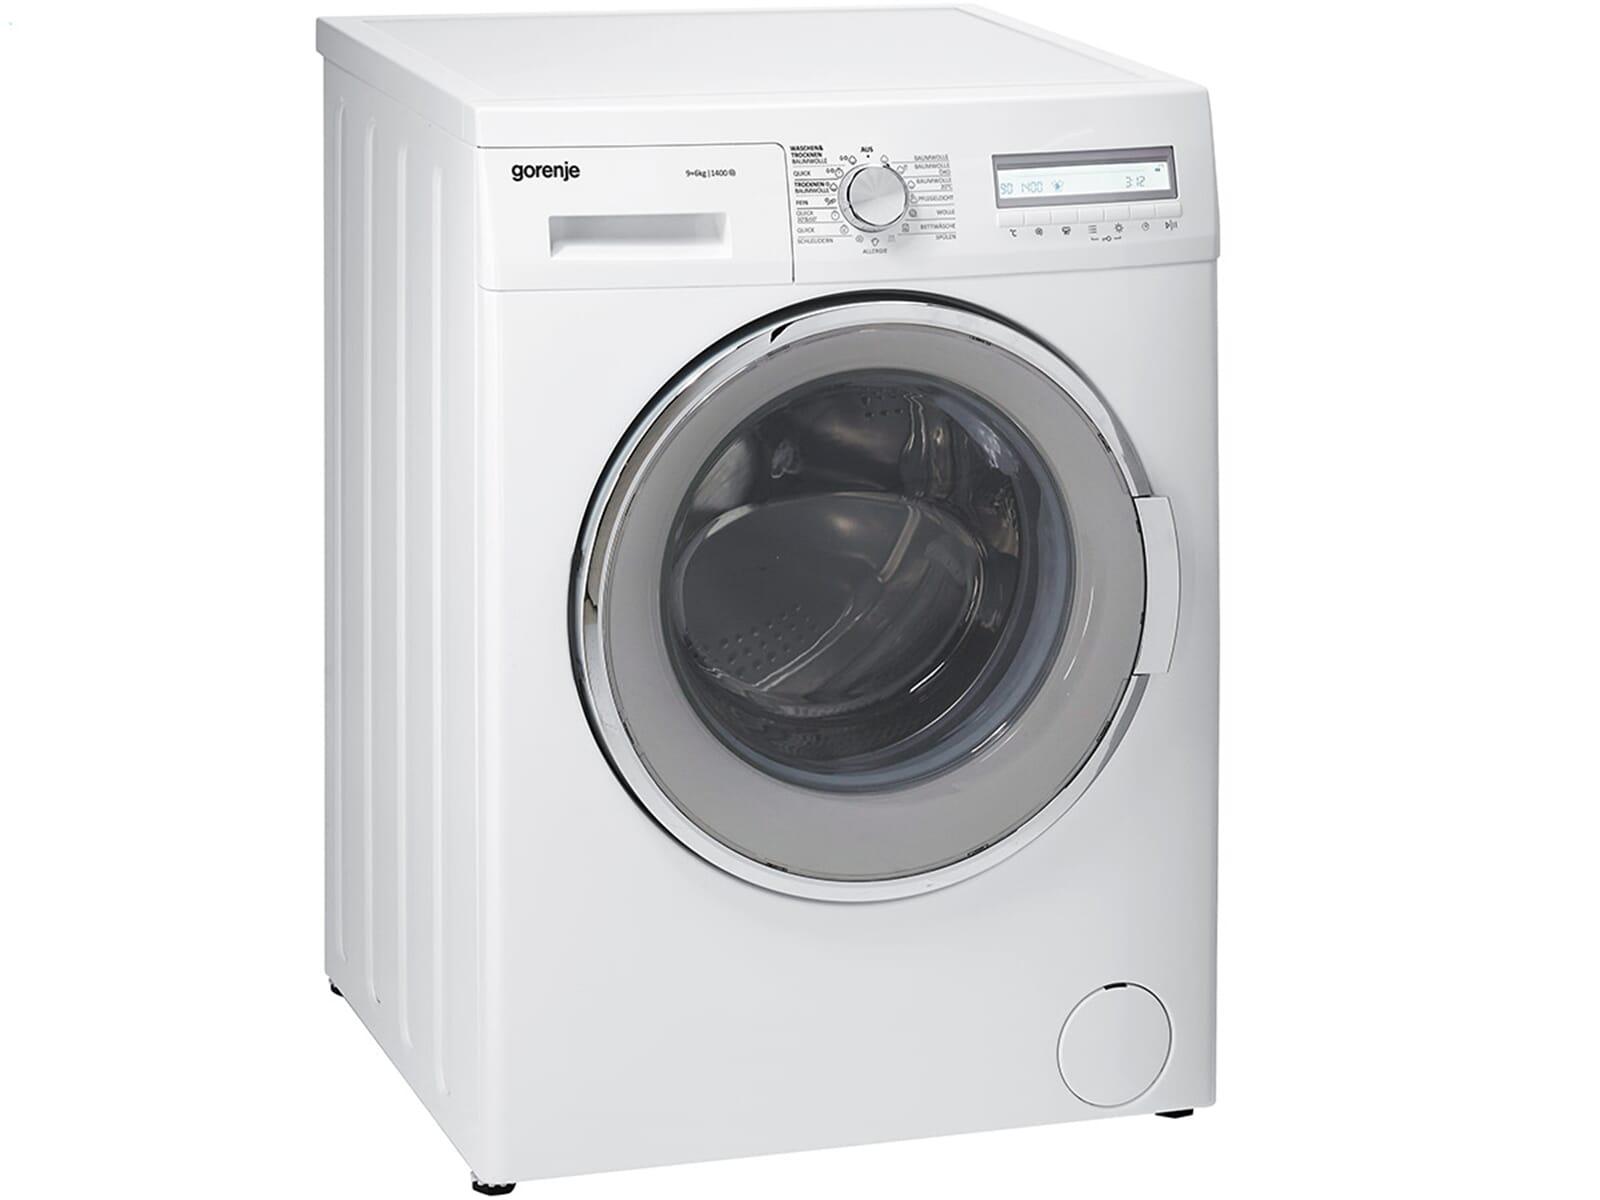 Gorenje wd de waschtrockner weiß